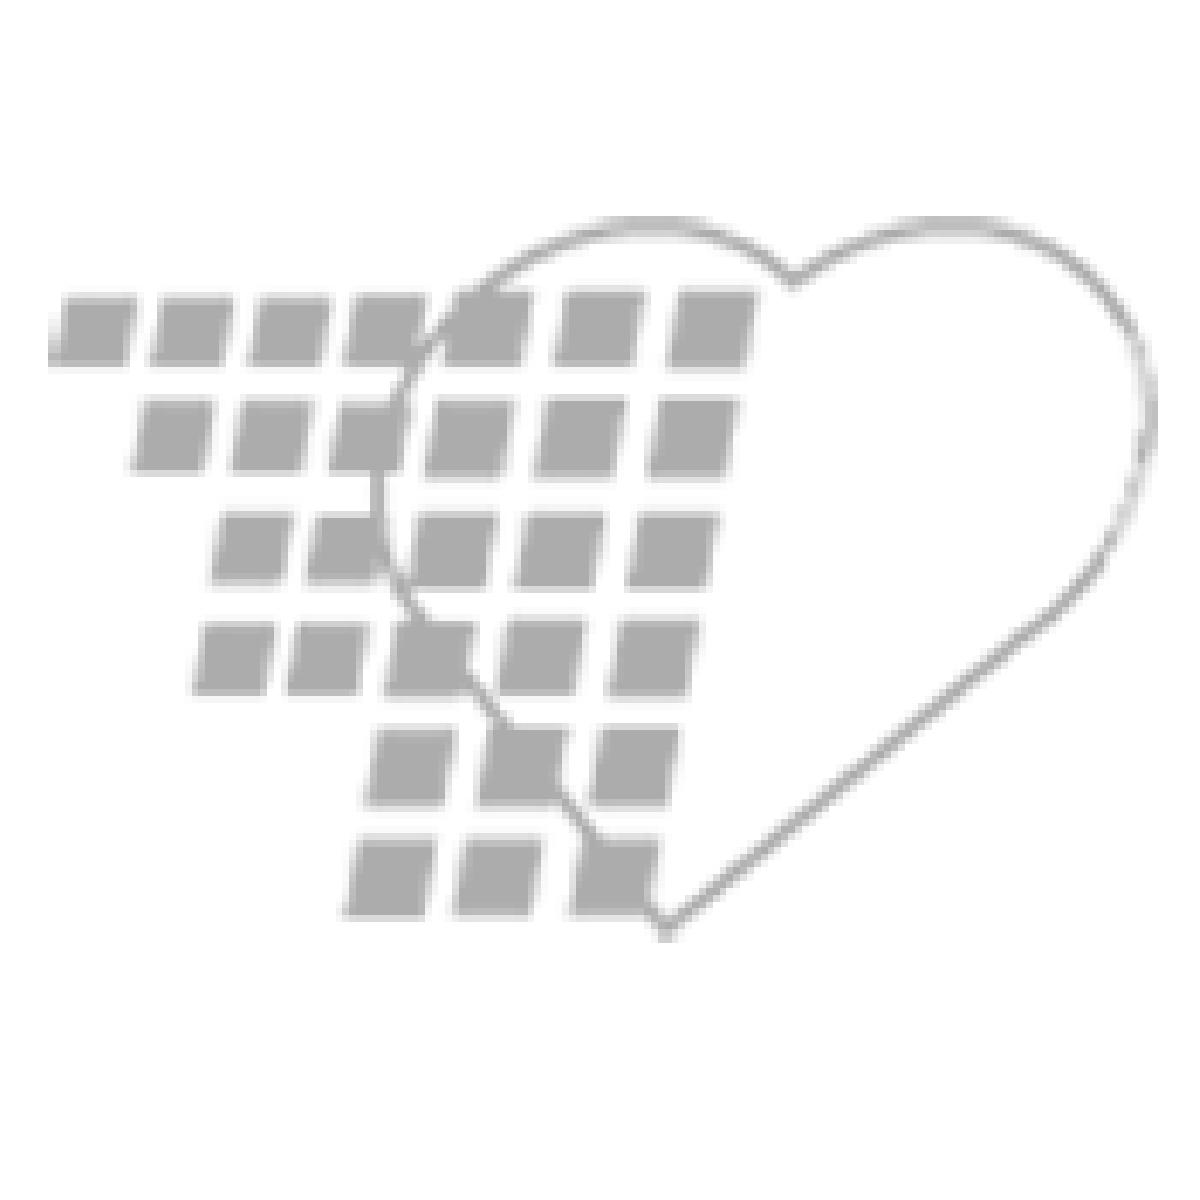 06-93-6942 - Demo Dose® LORazepm (Ativn) 1 mL (2 mg/mL)